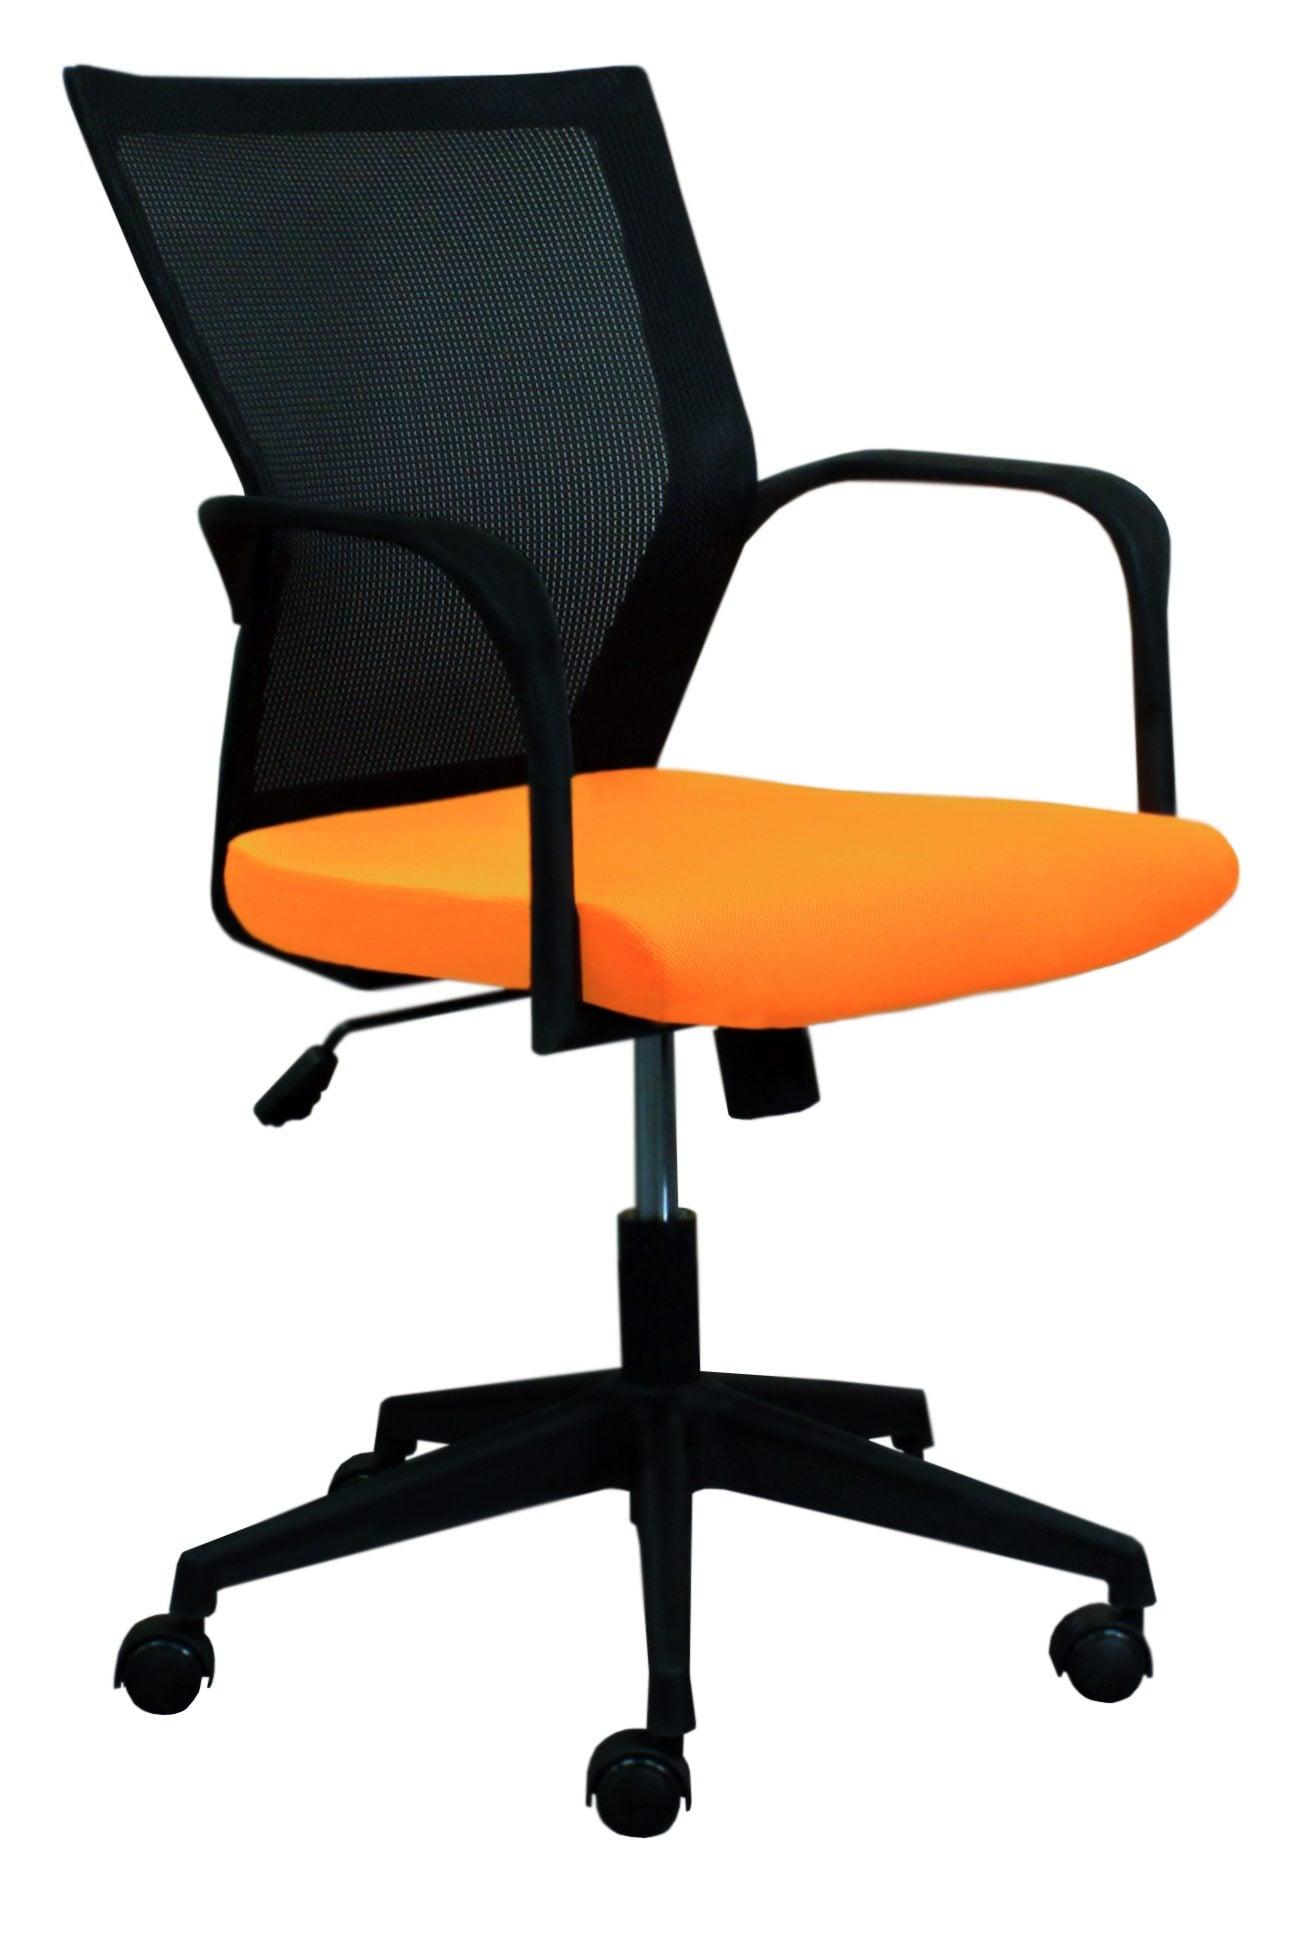 orange office chair rental utah bay by gosit mesh back task and black